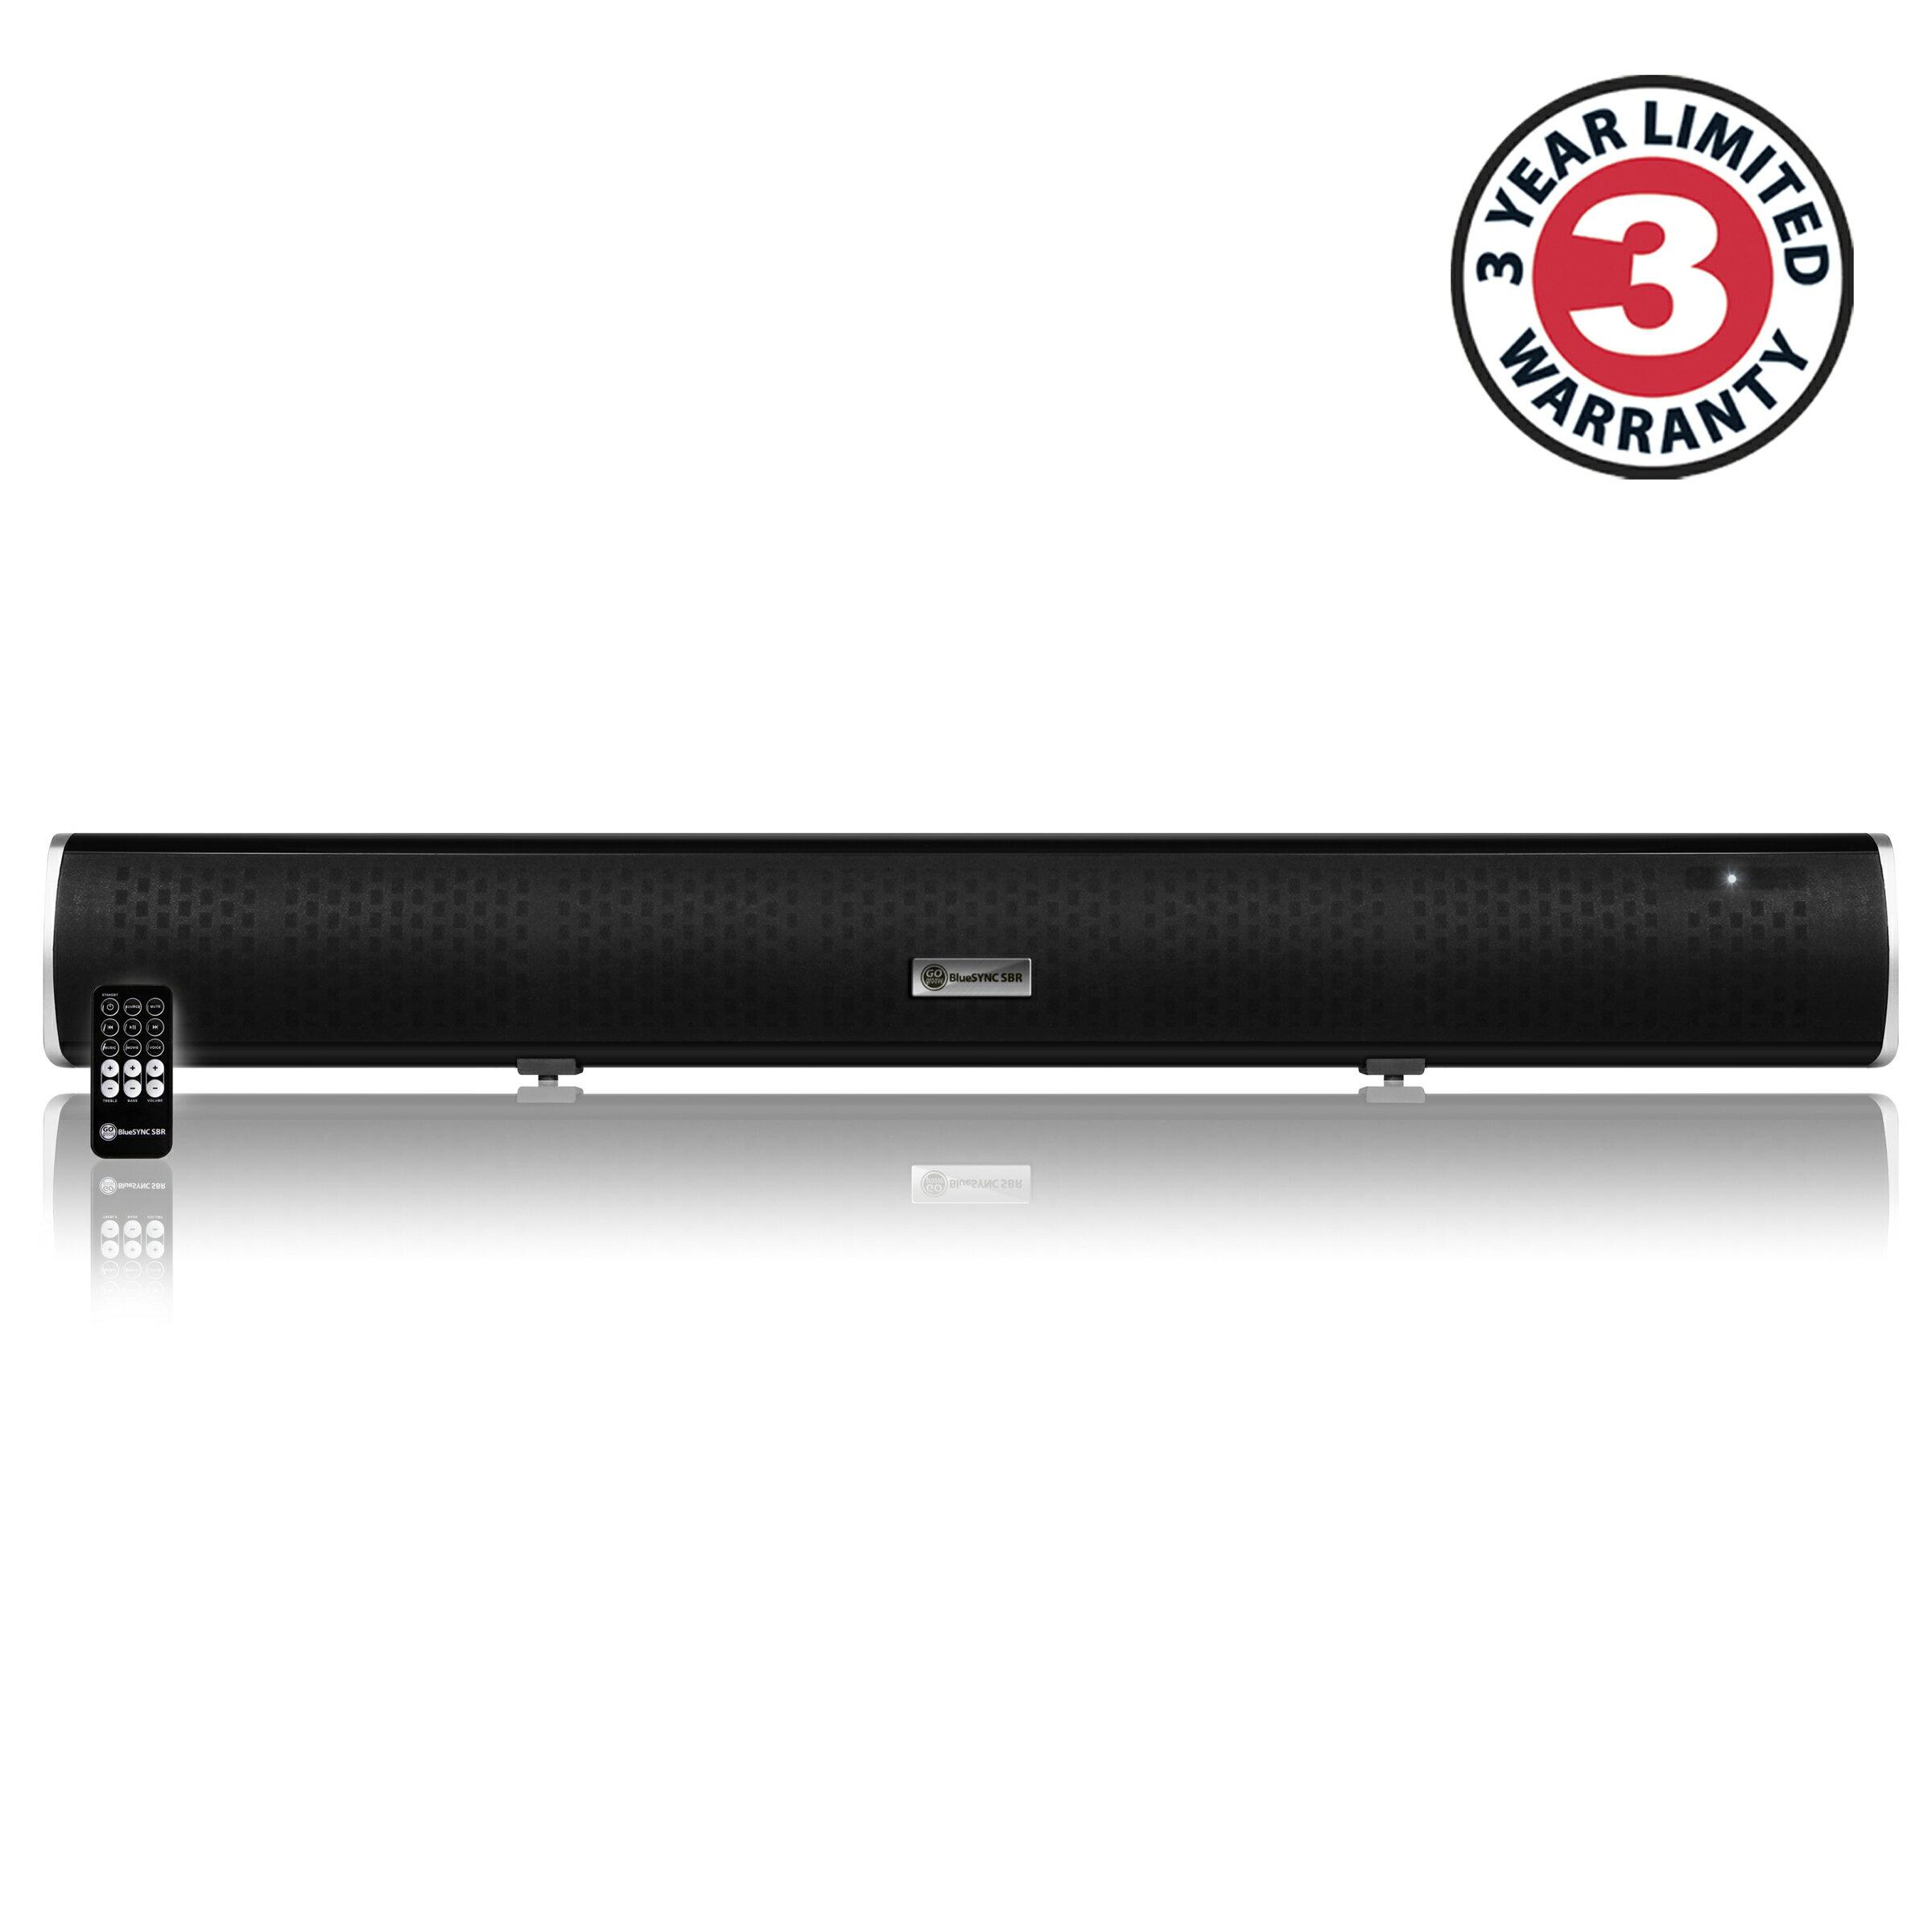 GOgroove Bluetooth Ultra Slim Sound Bar Speaker System w/ Wall Mounting Kit, Optical / Analog Inputs 1